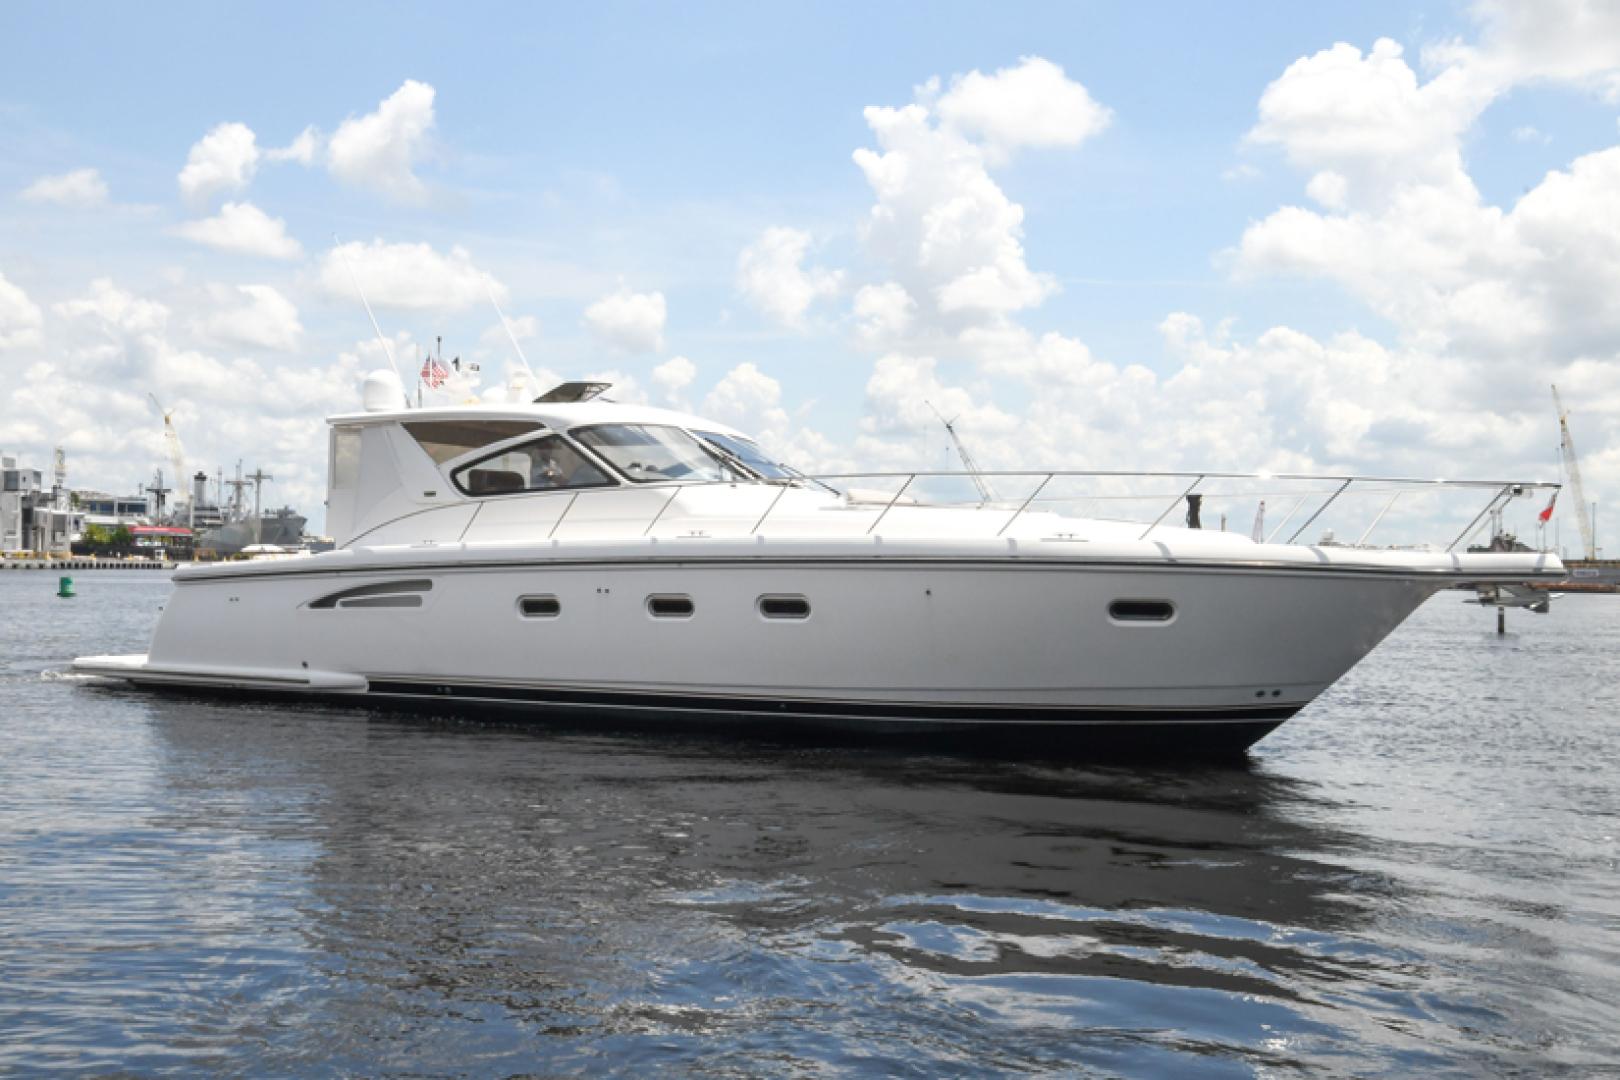 52' Tiara Yachts 2000 5200 Express Wander Lust